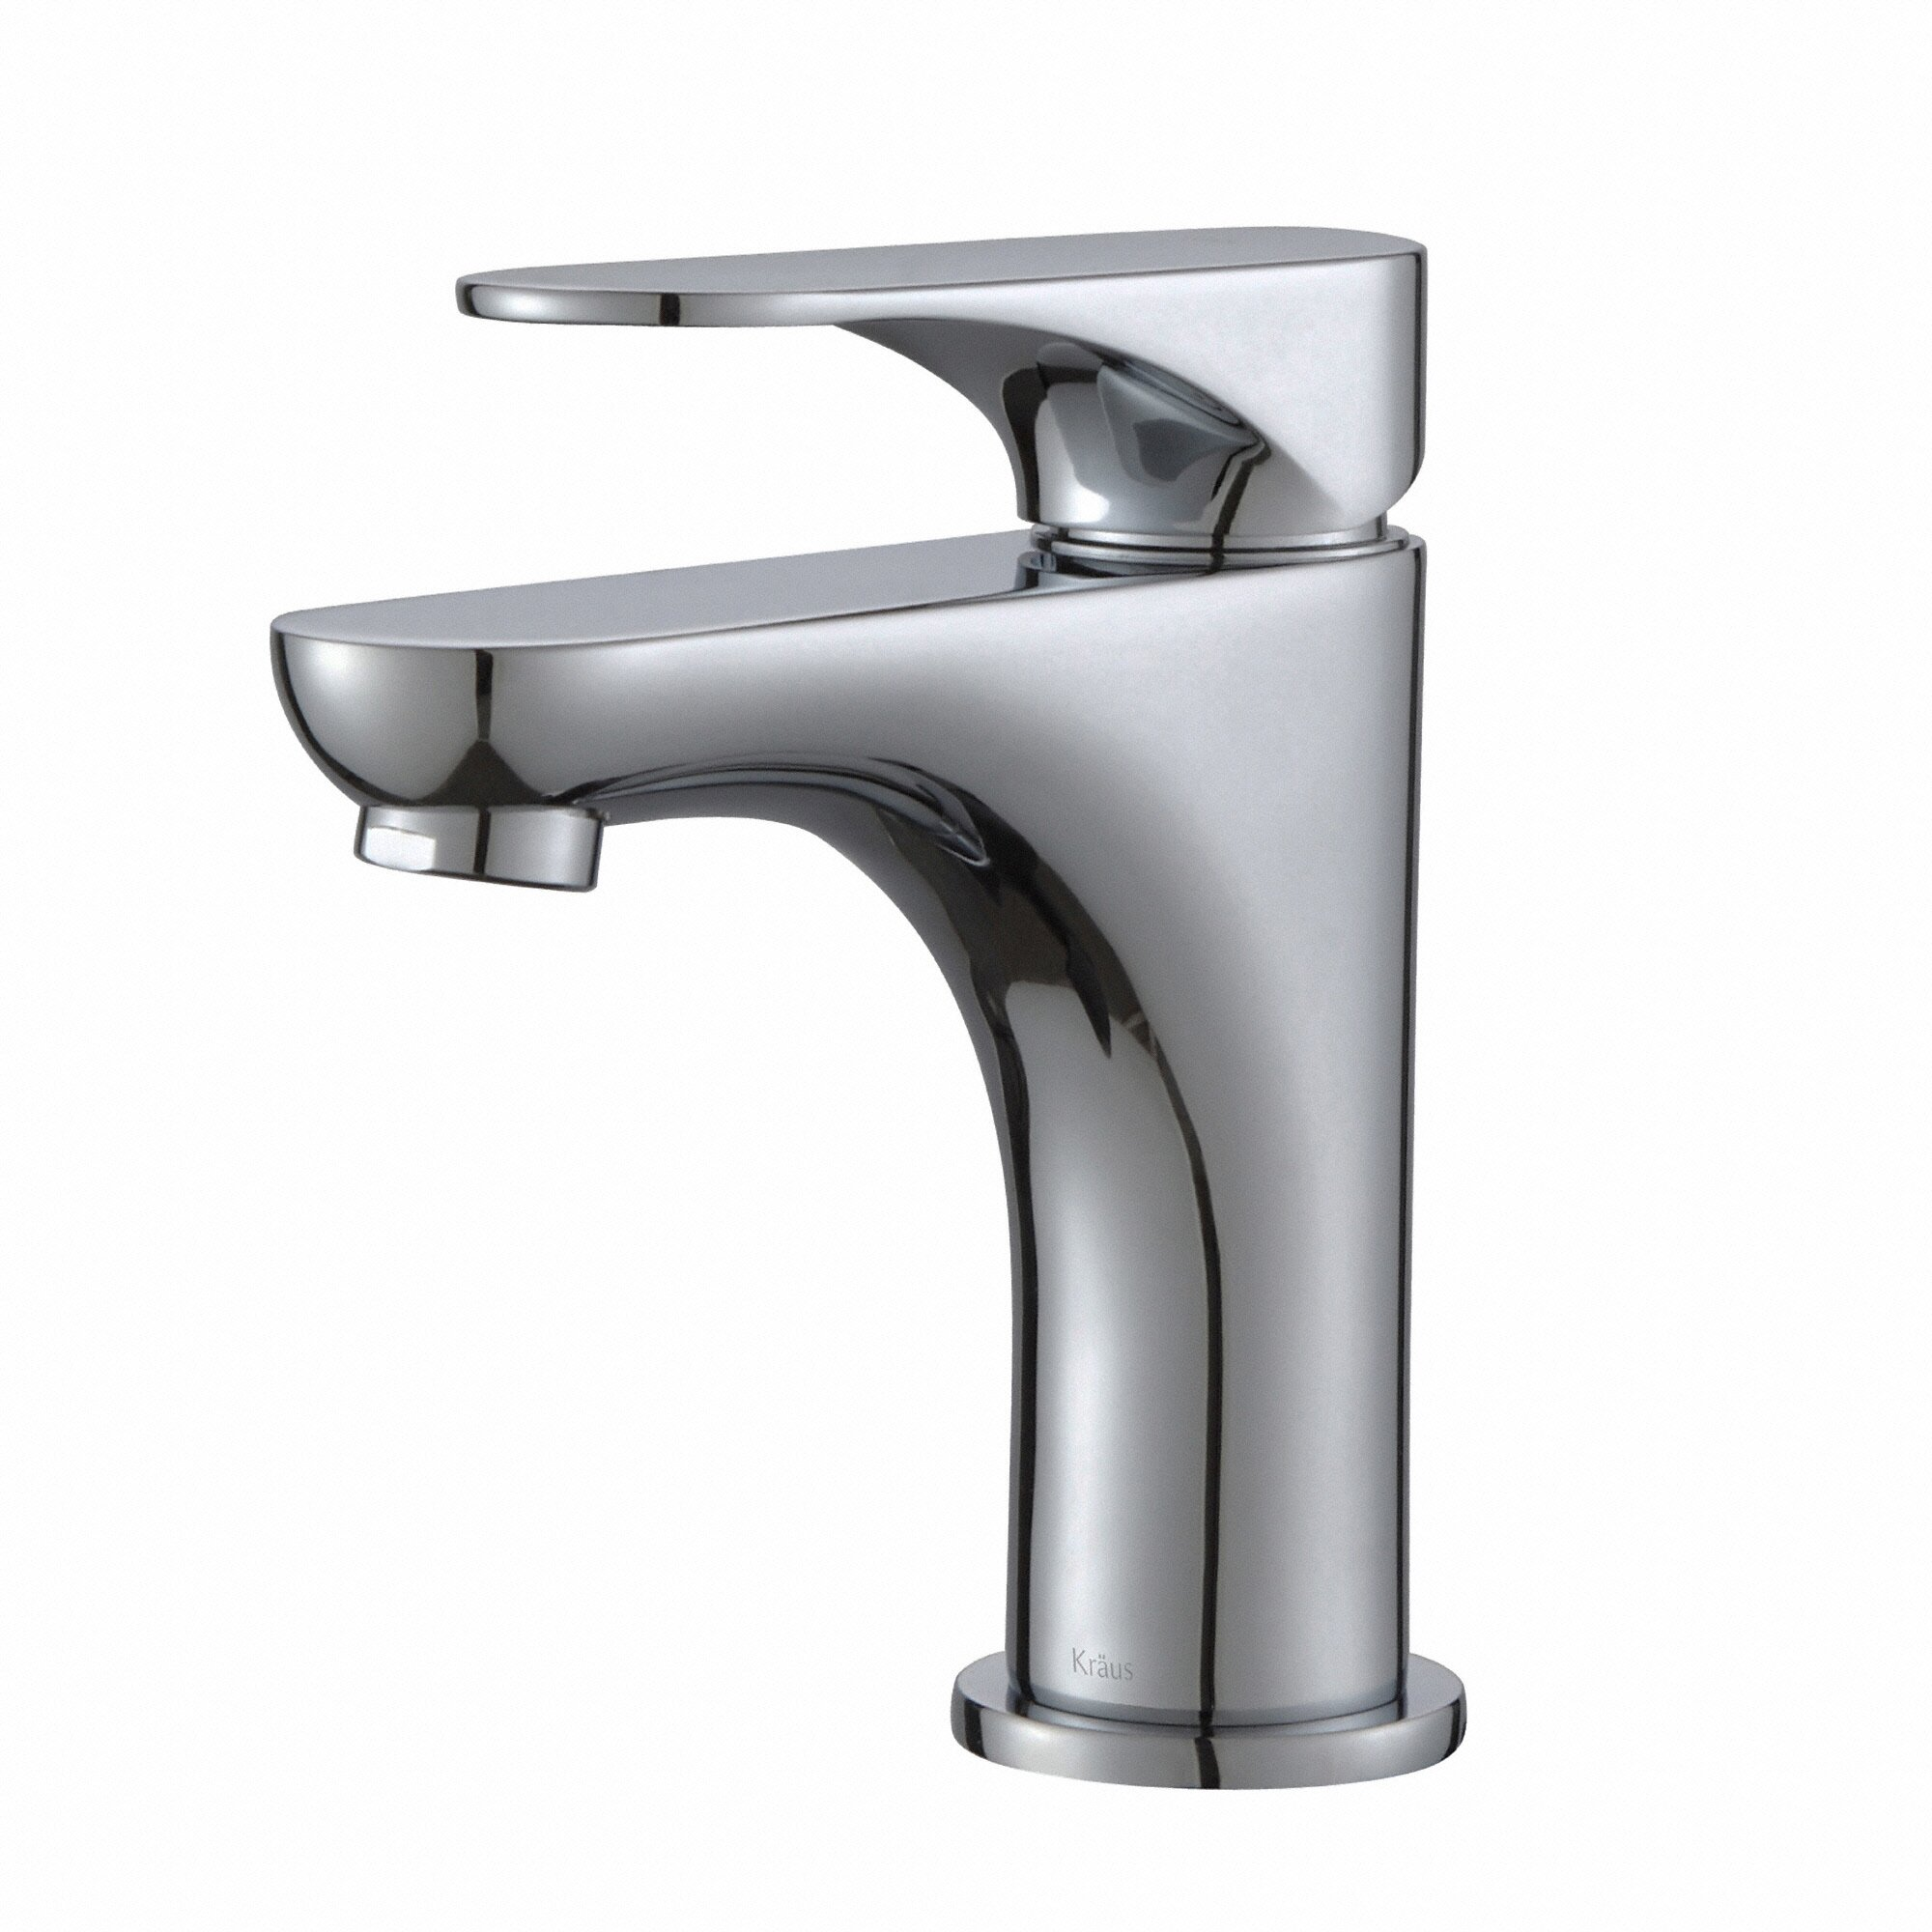 Kraus Faucets Reviews : Kraus Aquila Single Handle Bathroom Faucet & Reviews Wayfair